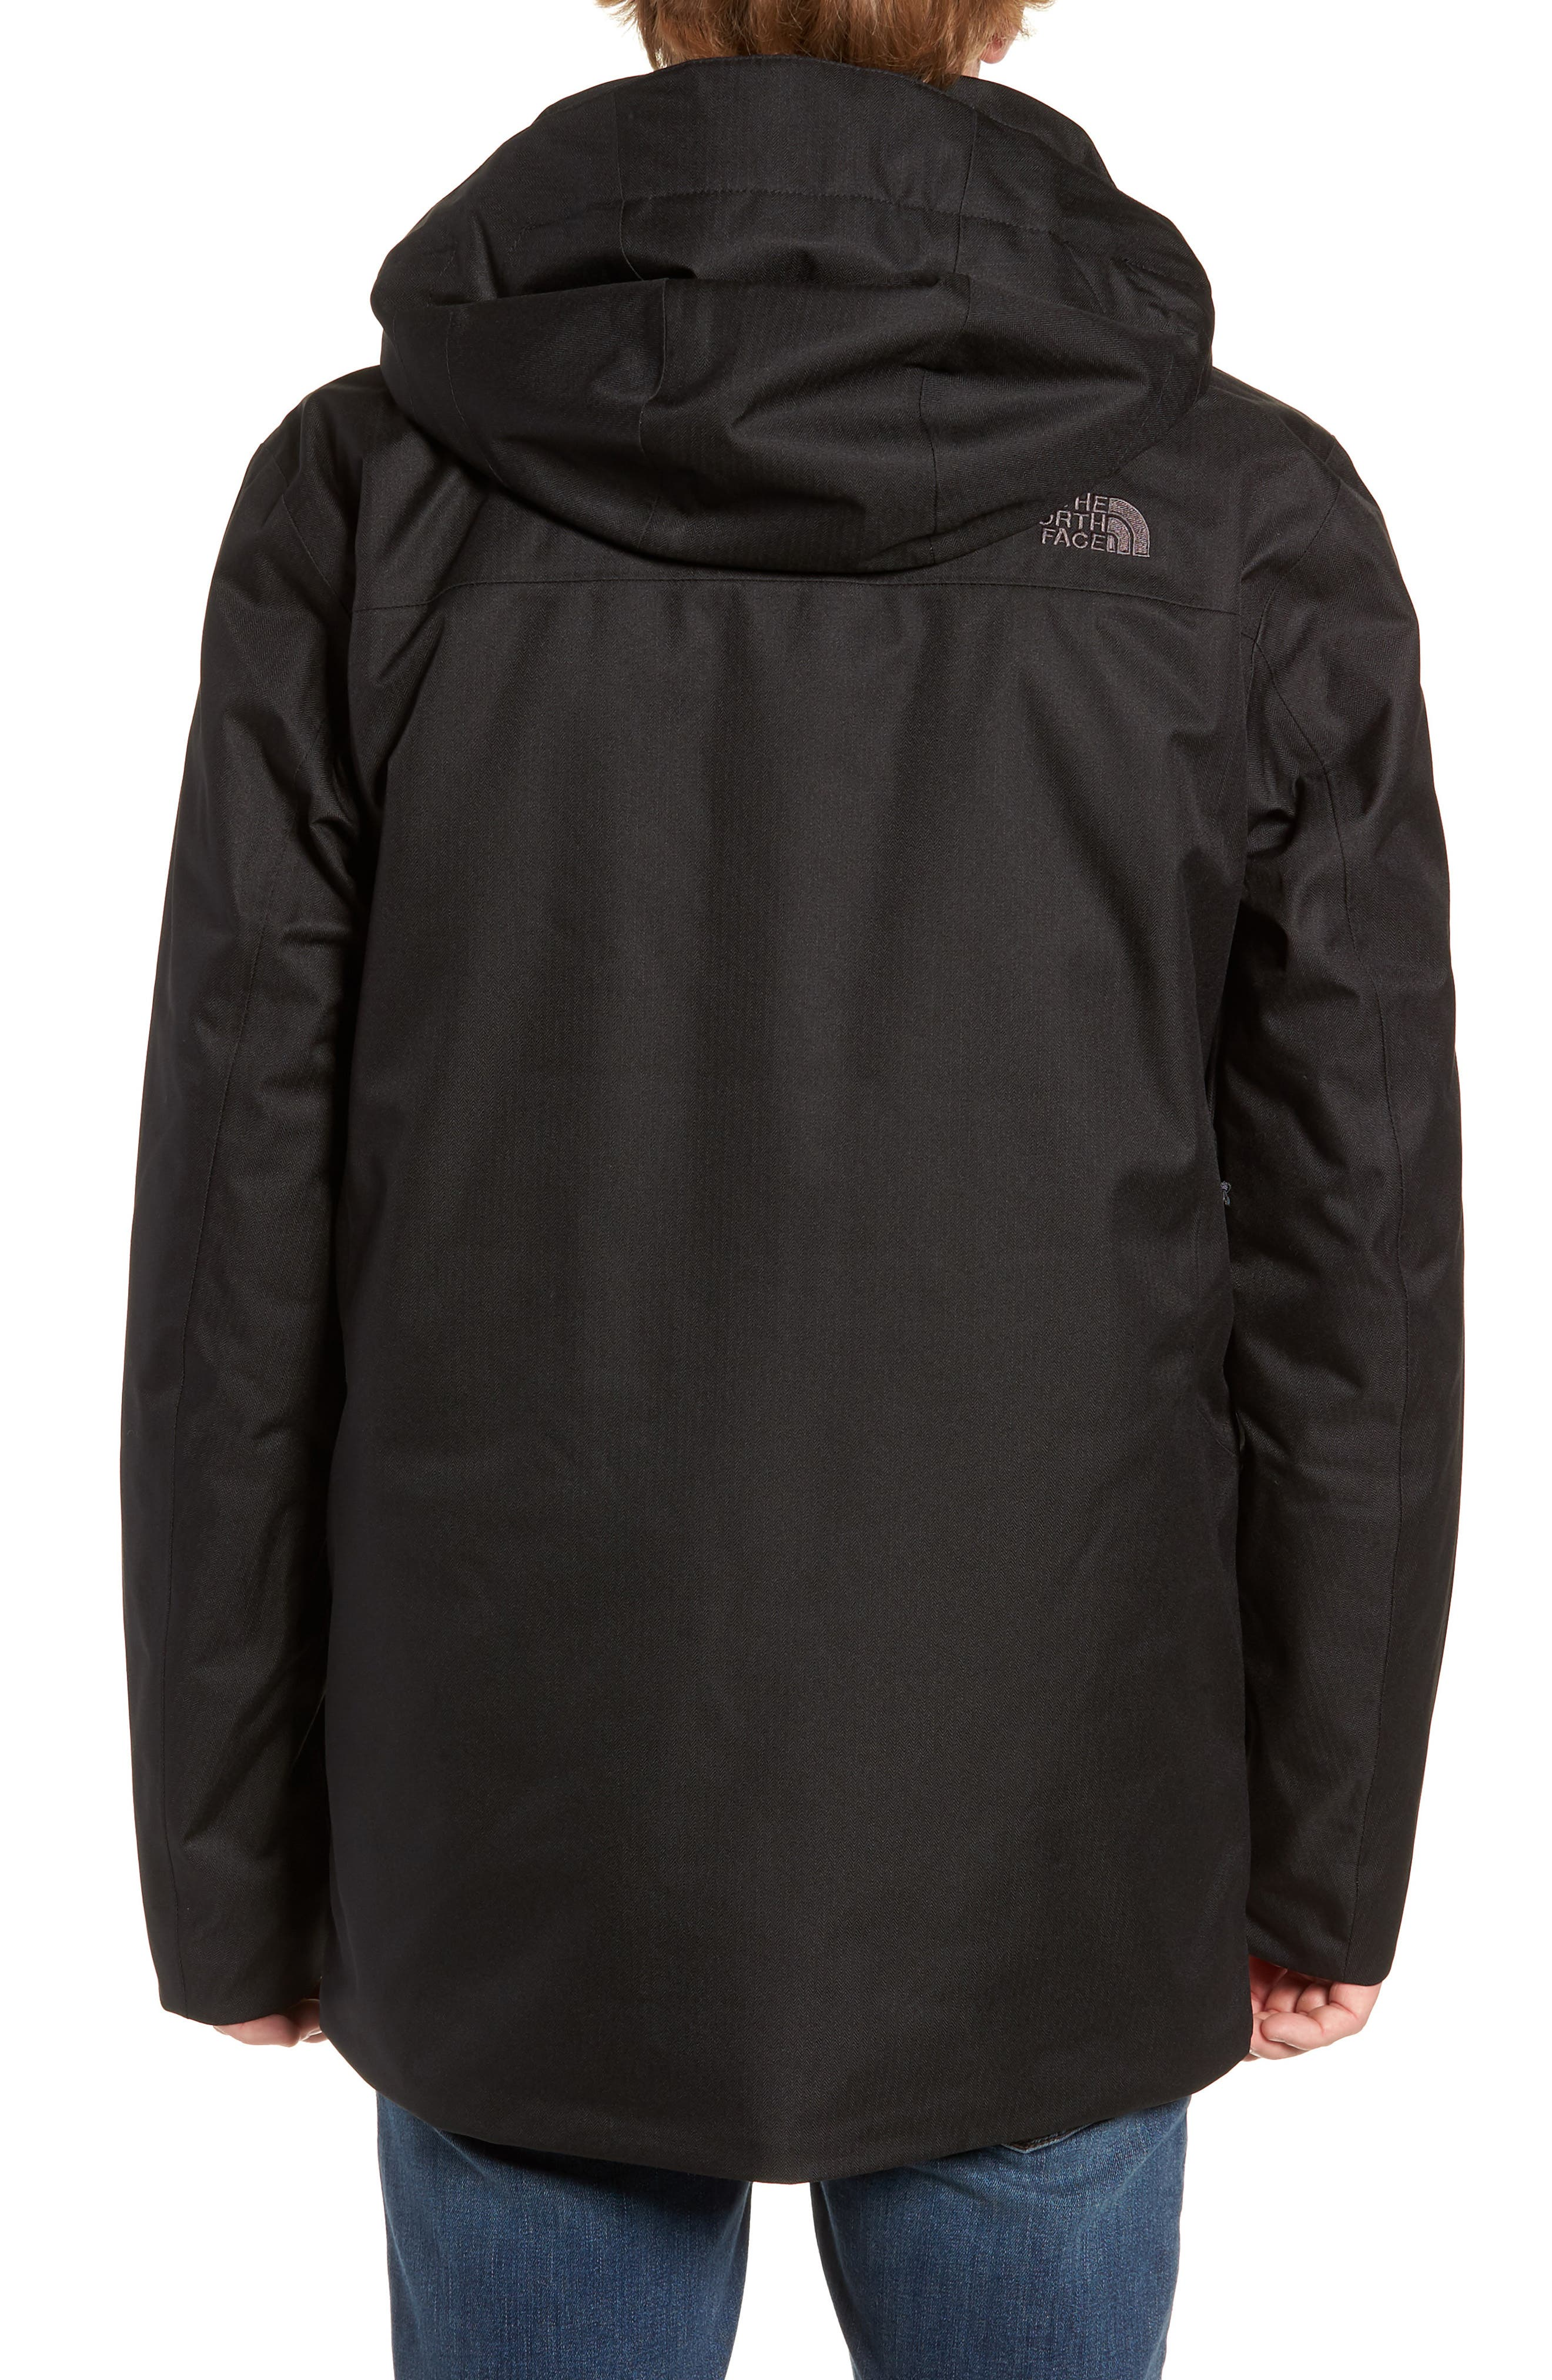 Gatekeeper Waterproof Jacket,                             Alternate thumbnail 2, color,                             TNF BLACK/TNF BLACK